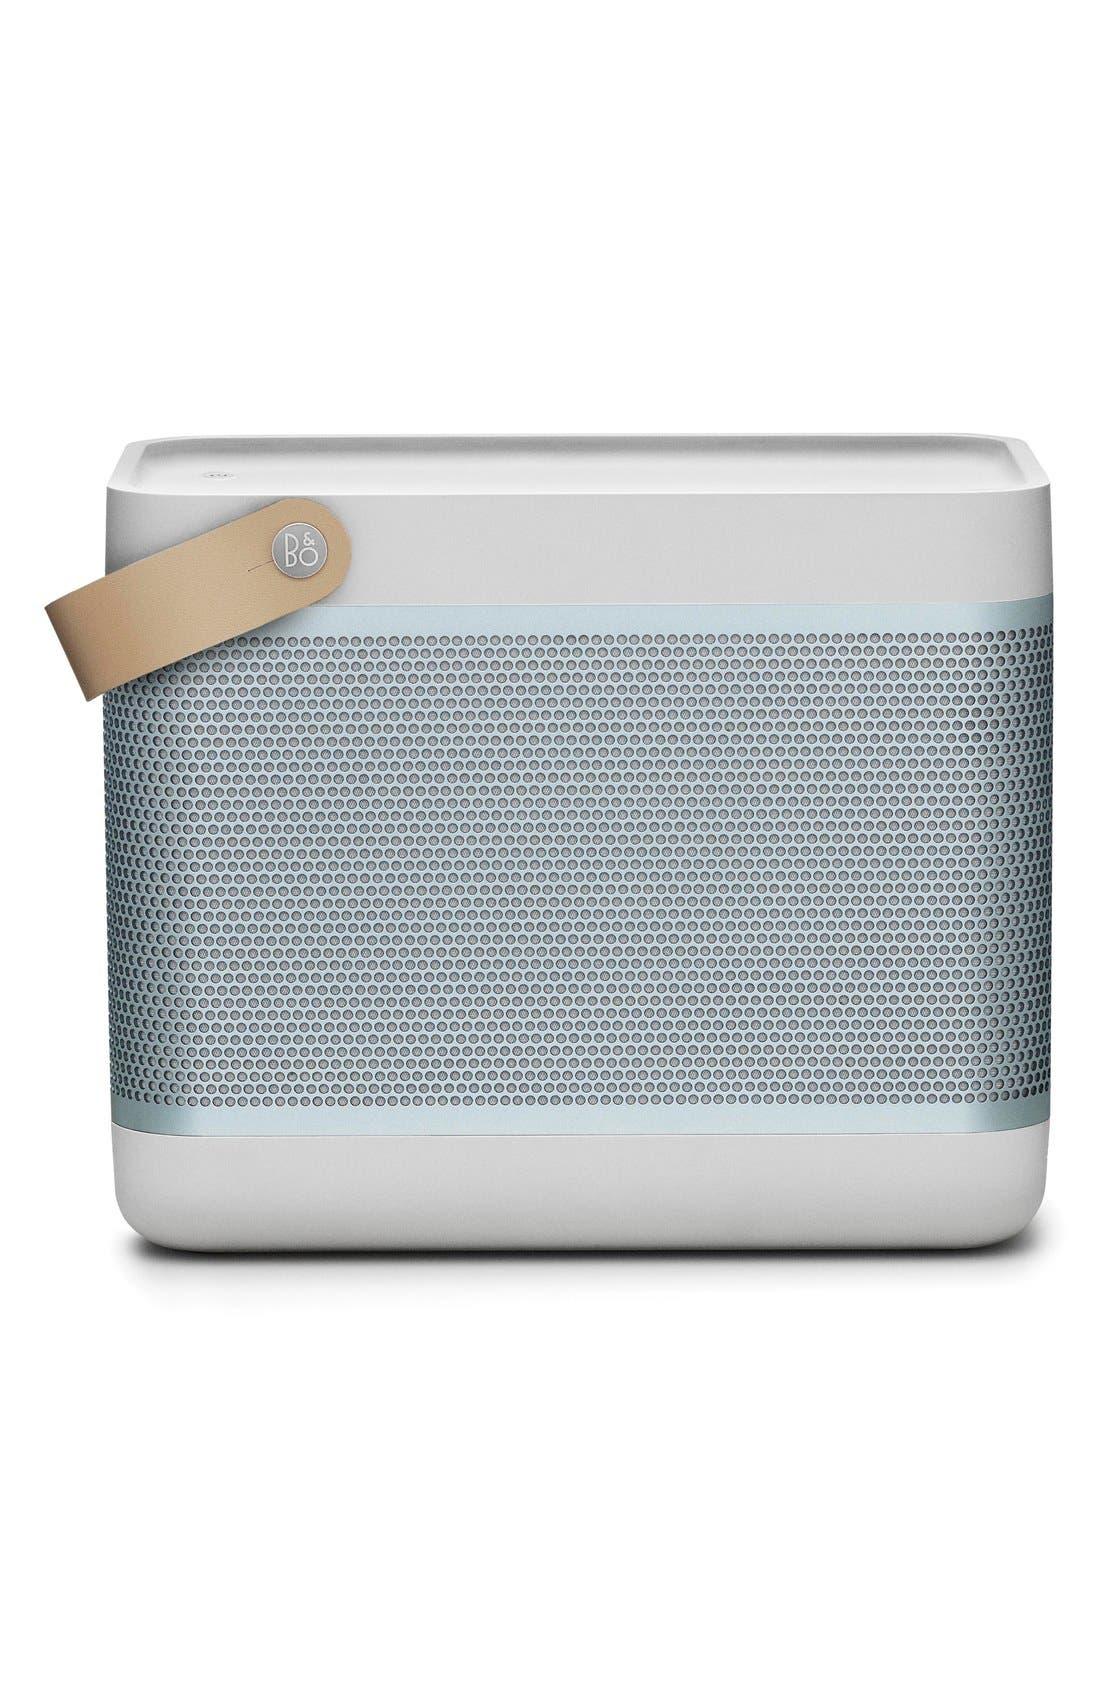 'Beolit 15' Portable Bluetooth<sup>®</sup> Speaker,                             Main thumbnail 1, color,                             POLAR BLUE